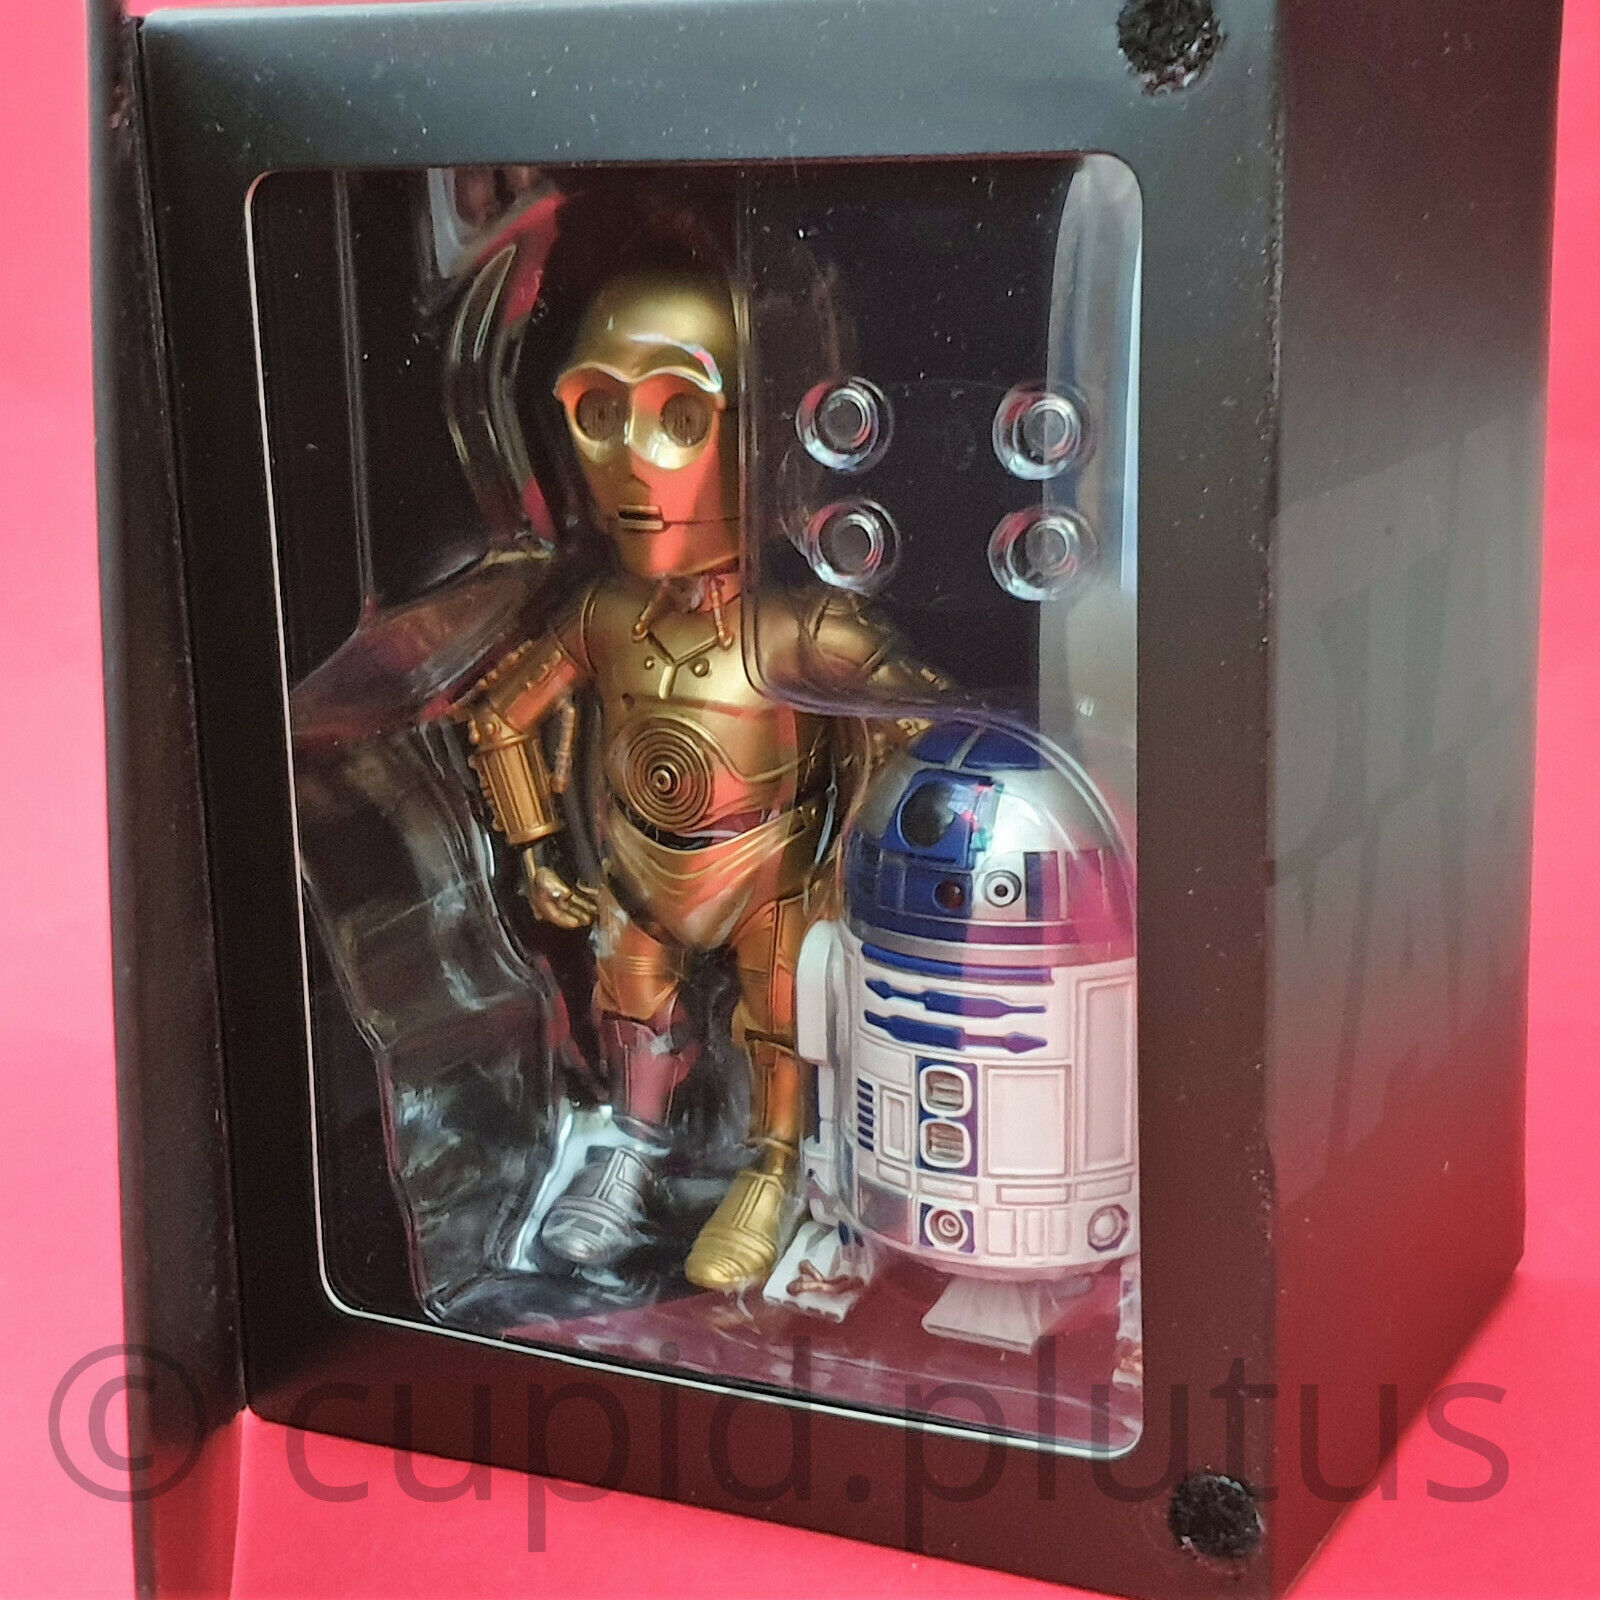 Herocross Stern Wars HMFkomfortabel35;024 C-3PO & R2-D2 Hybrid Metal Wirkung Figure Set (NEU)